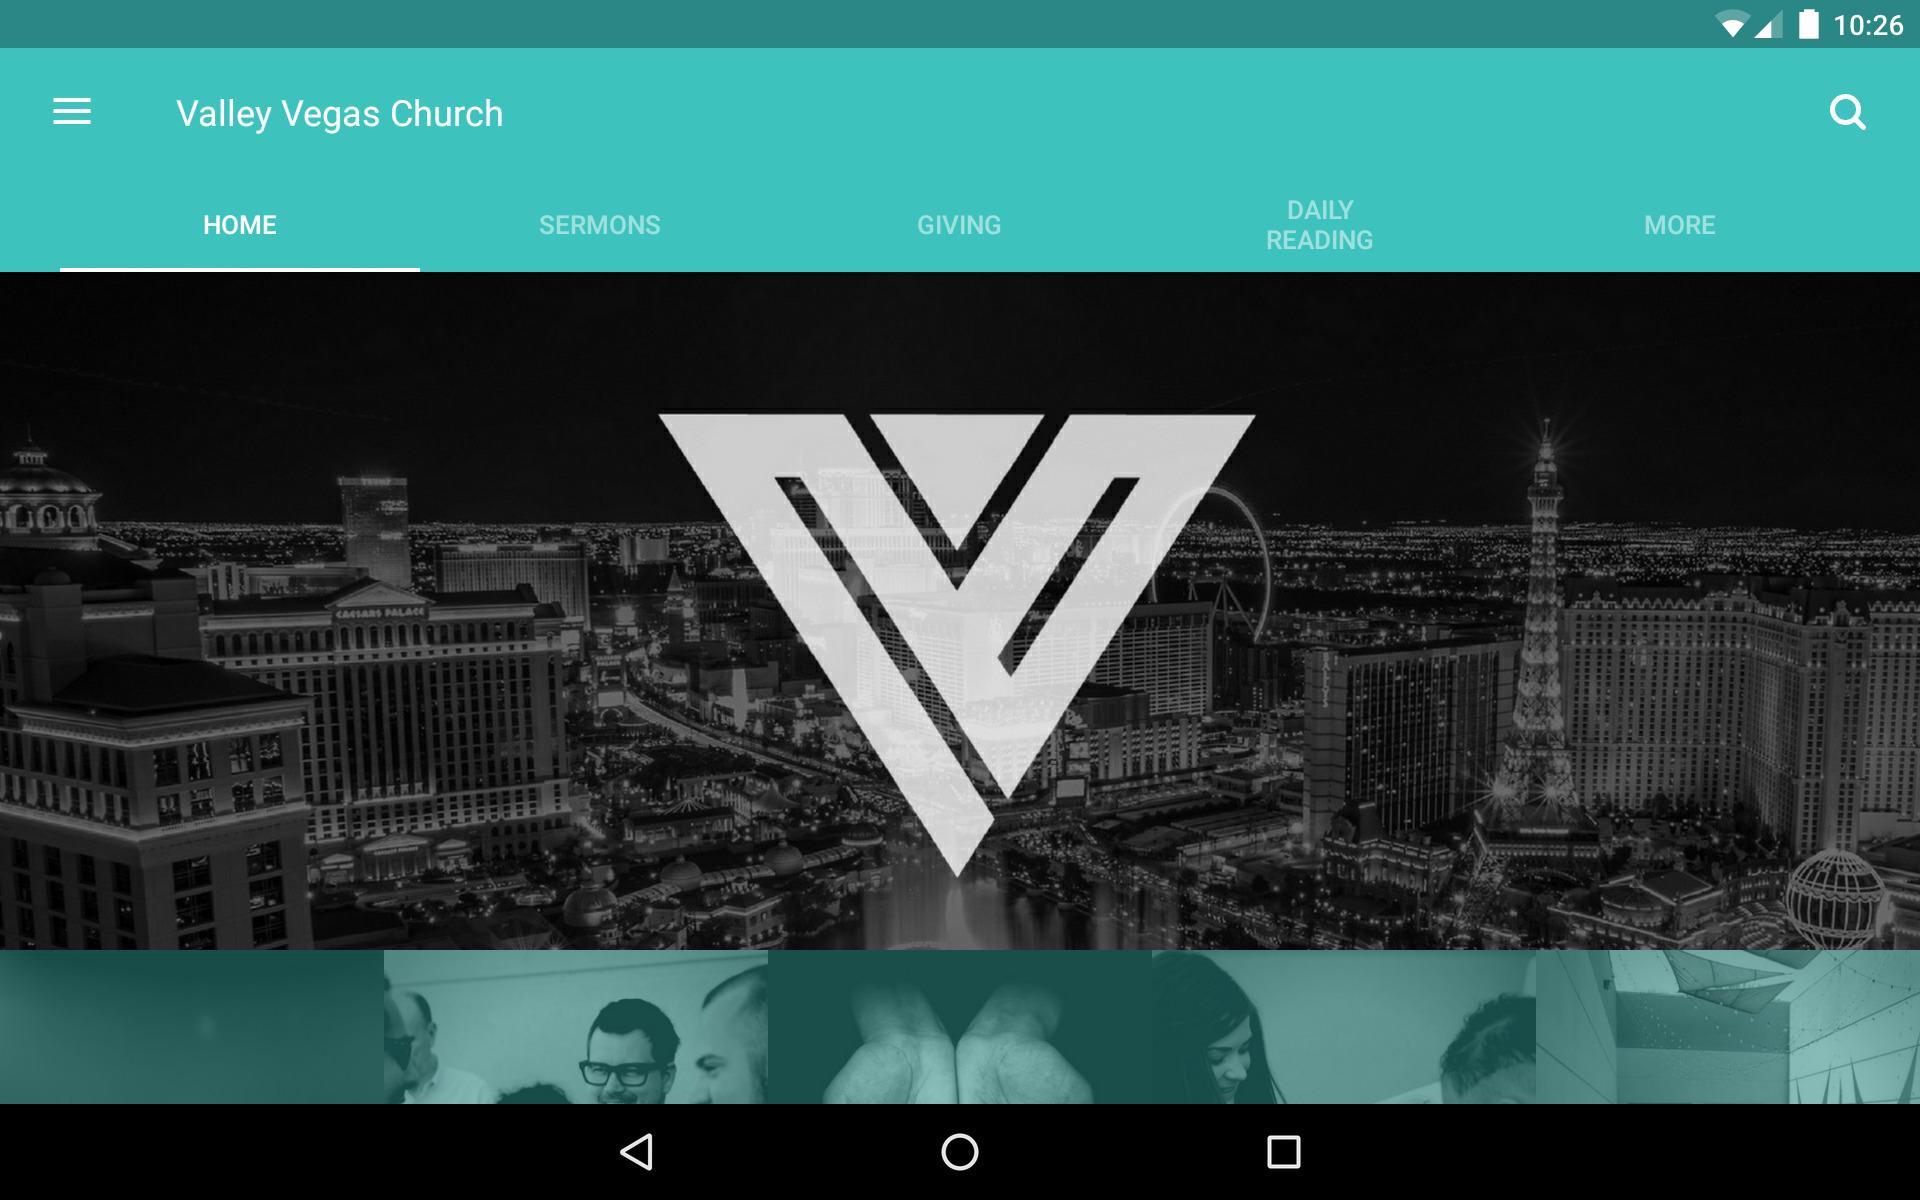 App - Valley Vegas Church